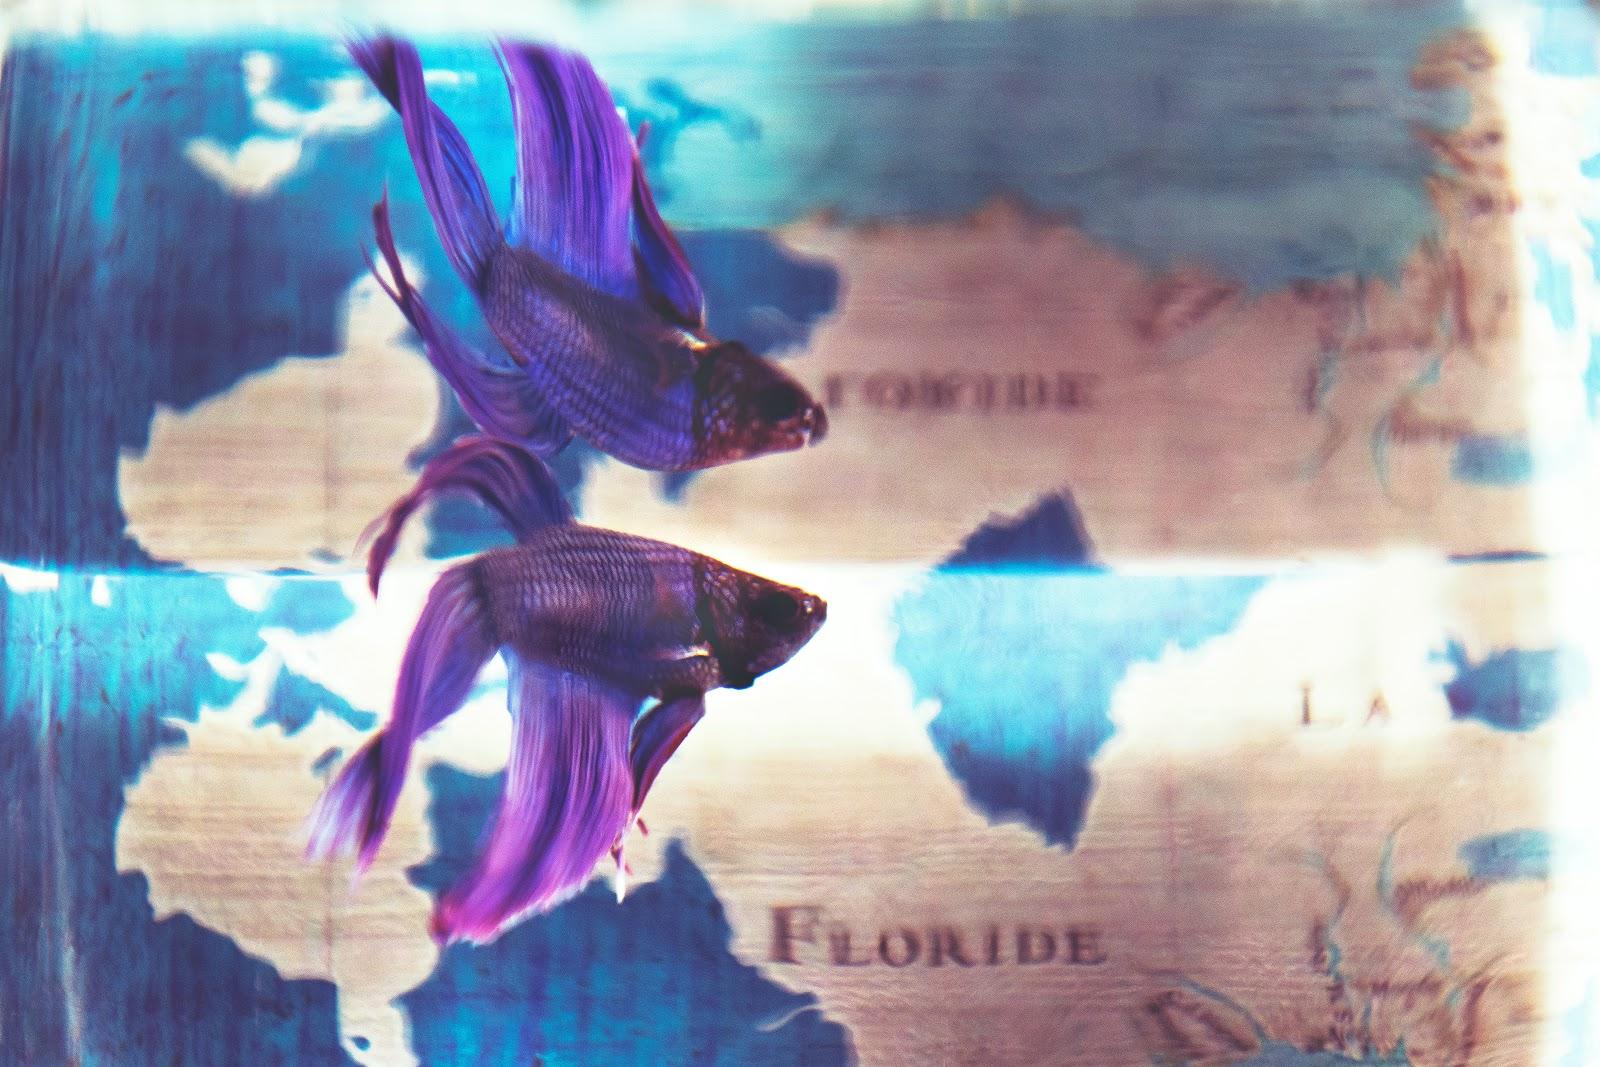 close-up-photo-of-purple-betta-fish-images